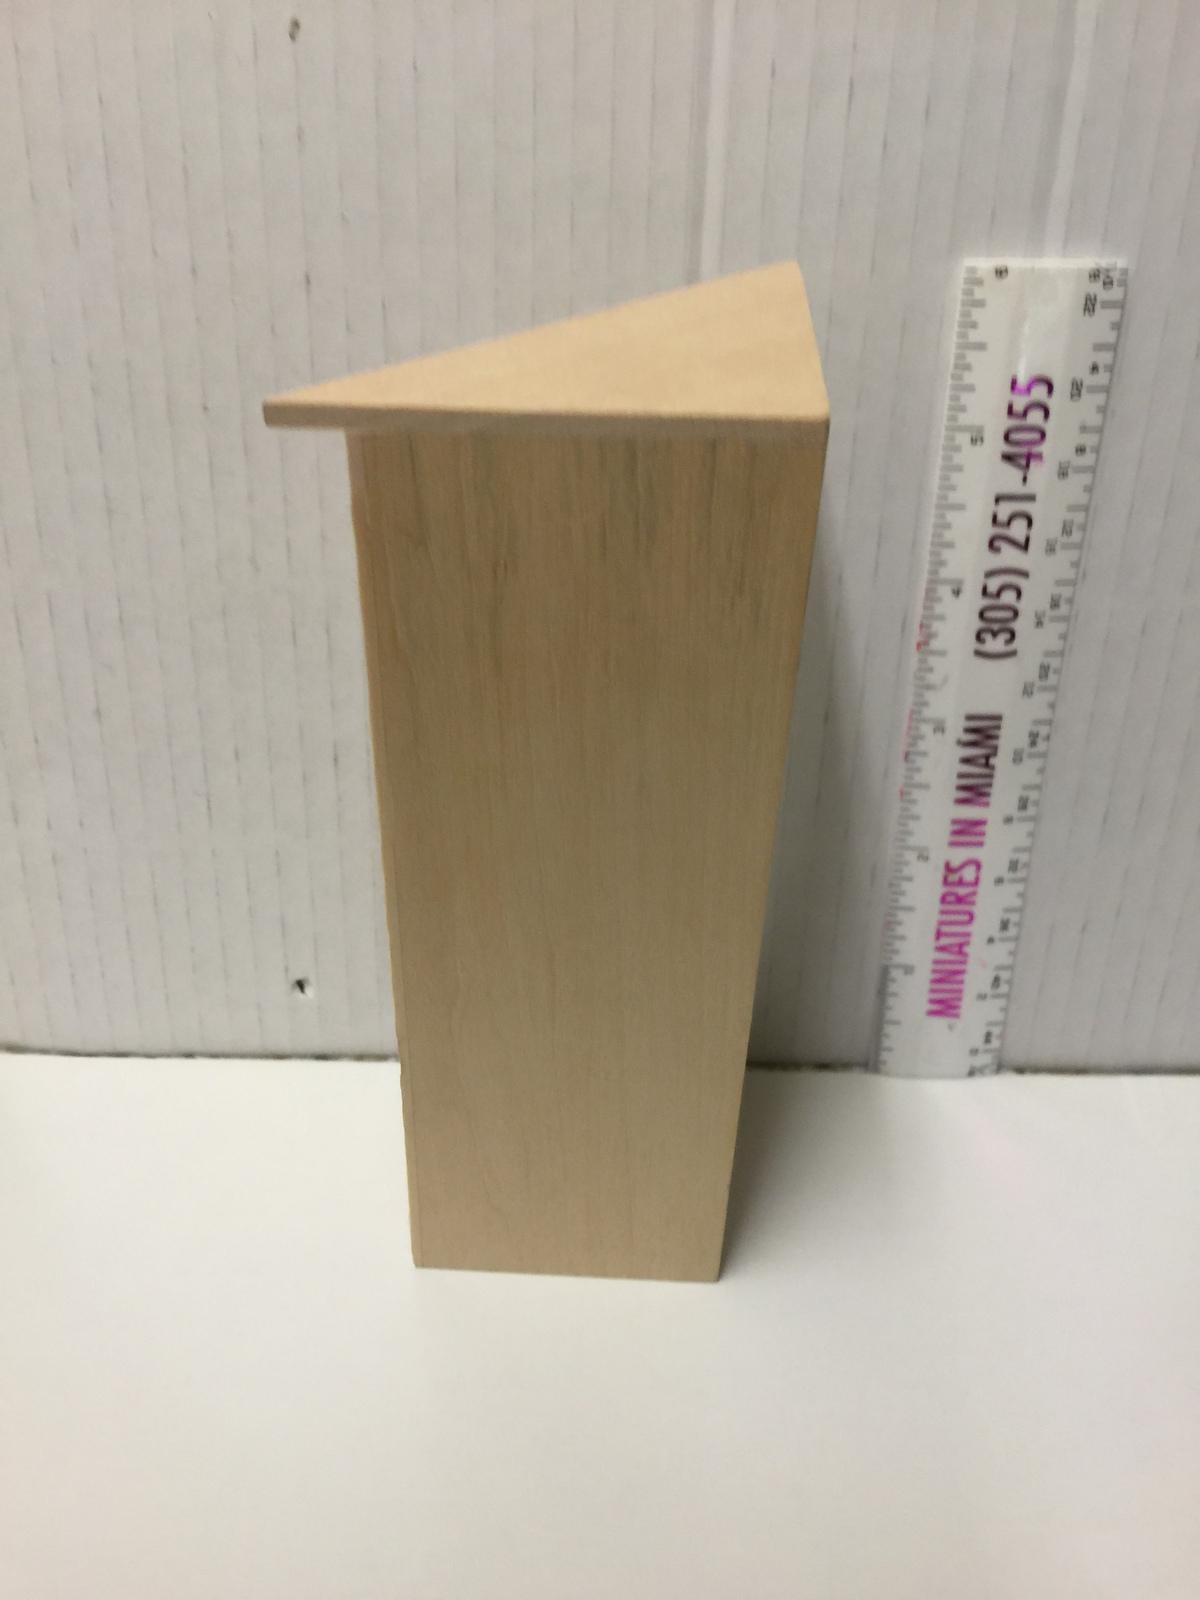 Miniature 5 Shelf Corner BOOKCASE UNIT Dollhouse Furniture Scale 1:12 / unfinish image 5